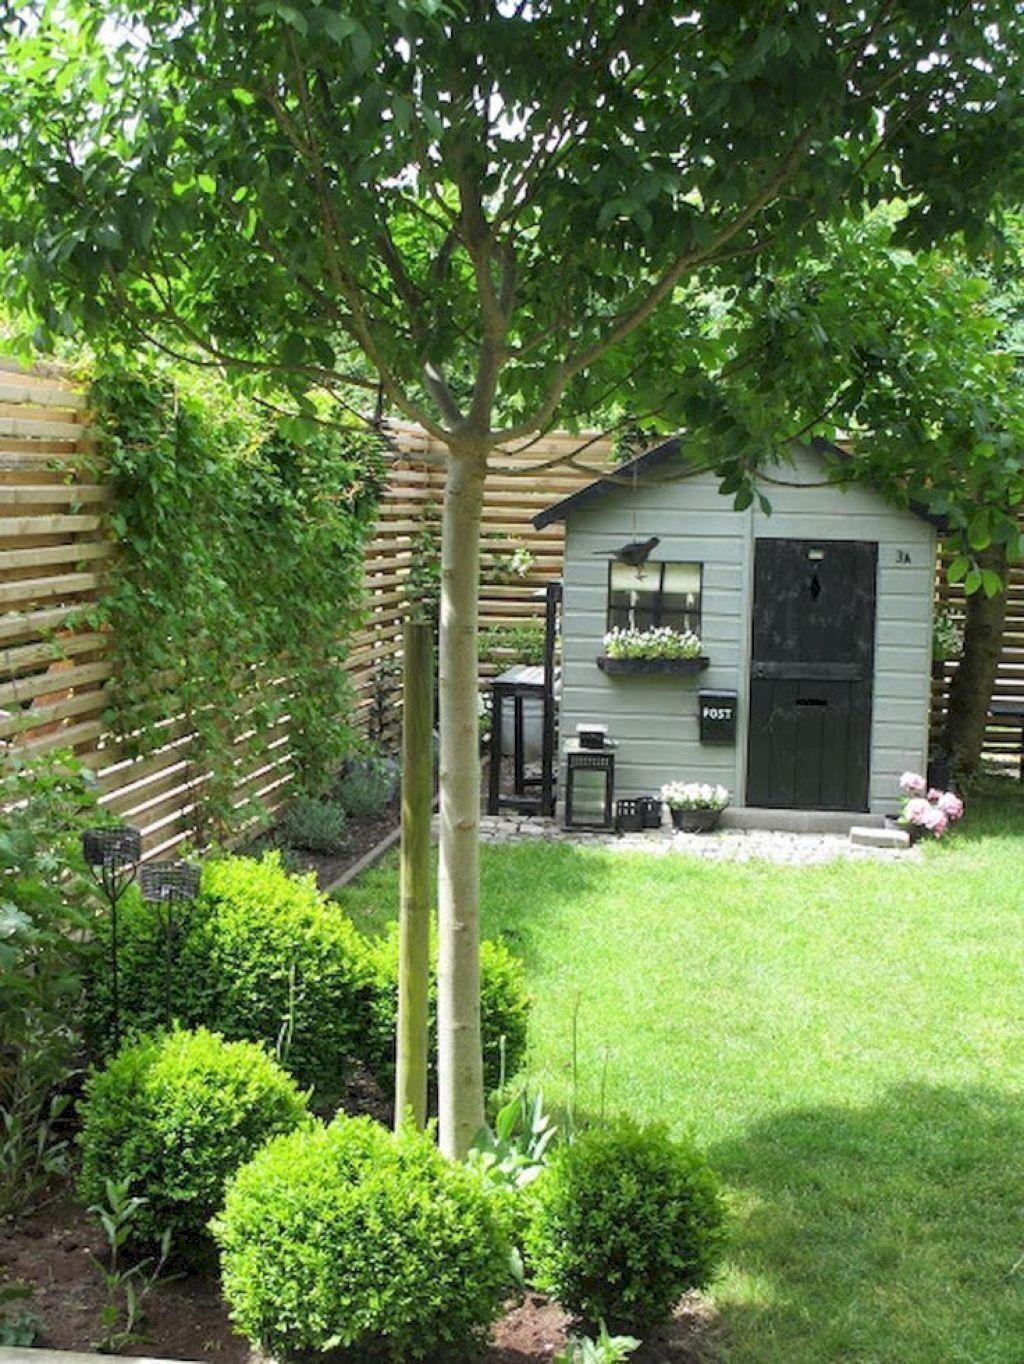 95 Amazing Small Garden Design Ideas Domakeover Com Nice 95 Amazing Small Garden Design Ideas Domakeover Com Ama In 2020 Male Zahrady Krajinarstvi Pobyt V Prirode